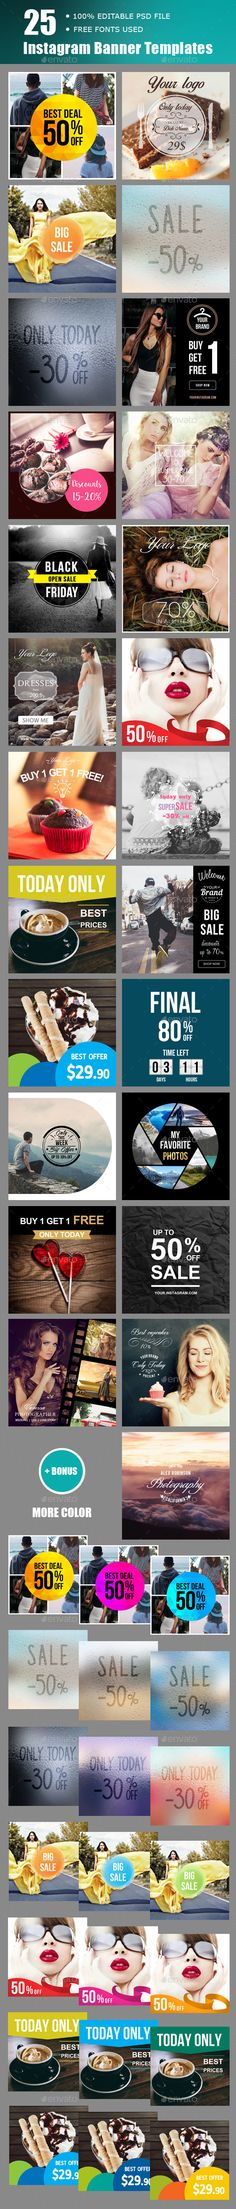 25 Instagram Banner Templates - Download Here : http://graphicriver.net/item/instagram-banner-templates/15505712?ref=yinkira